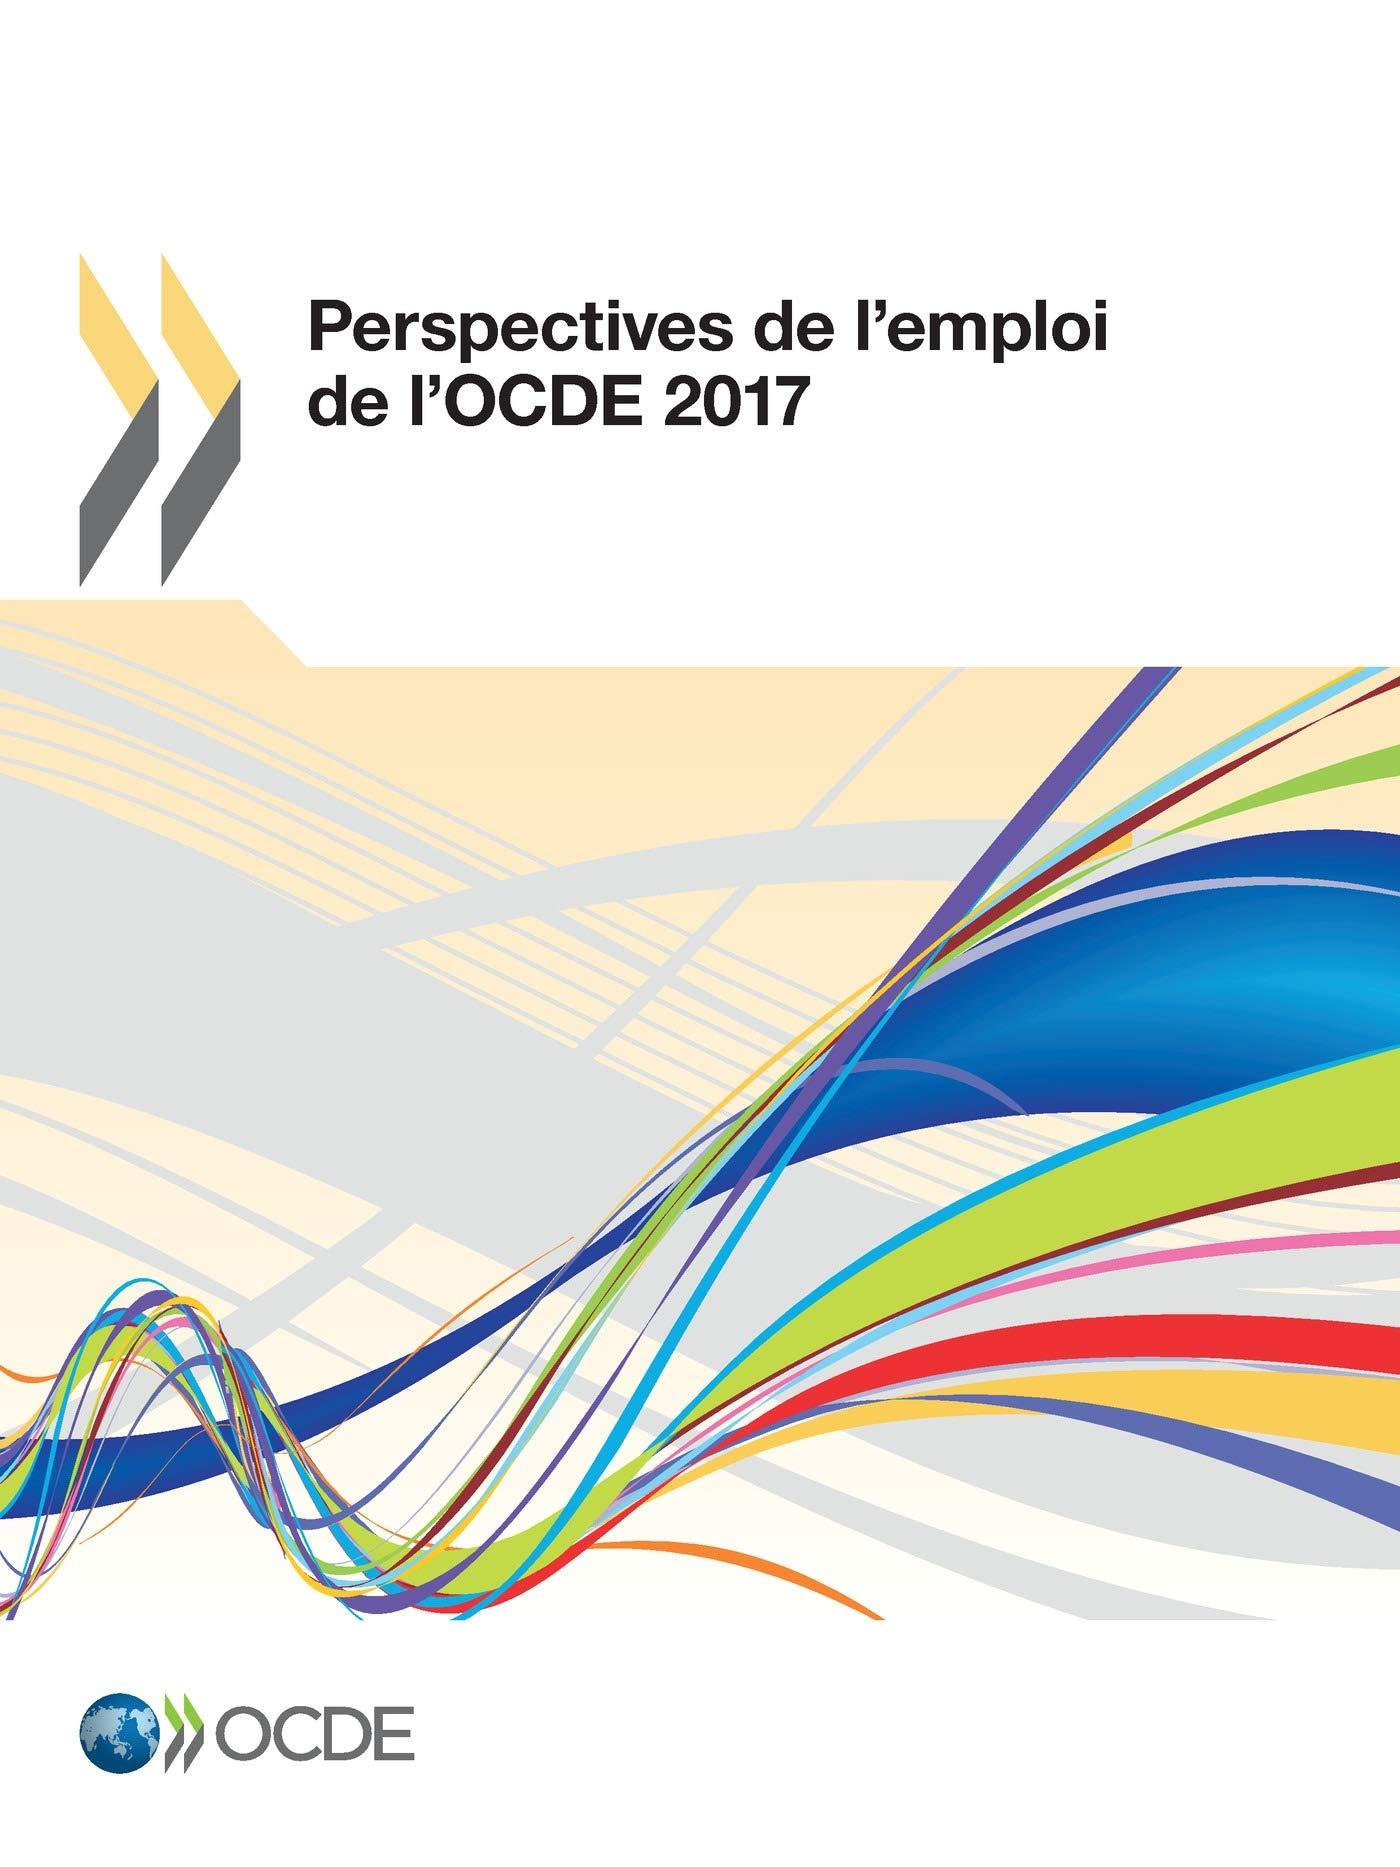 Perspectives de l'emploi de l'OCDE 2017 (French Edition)